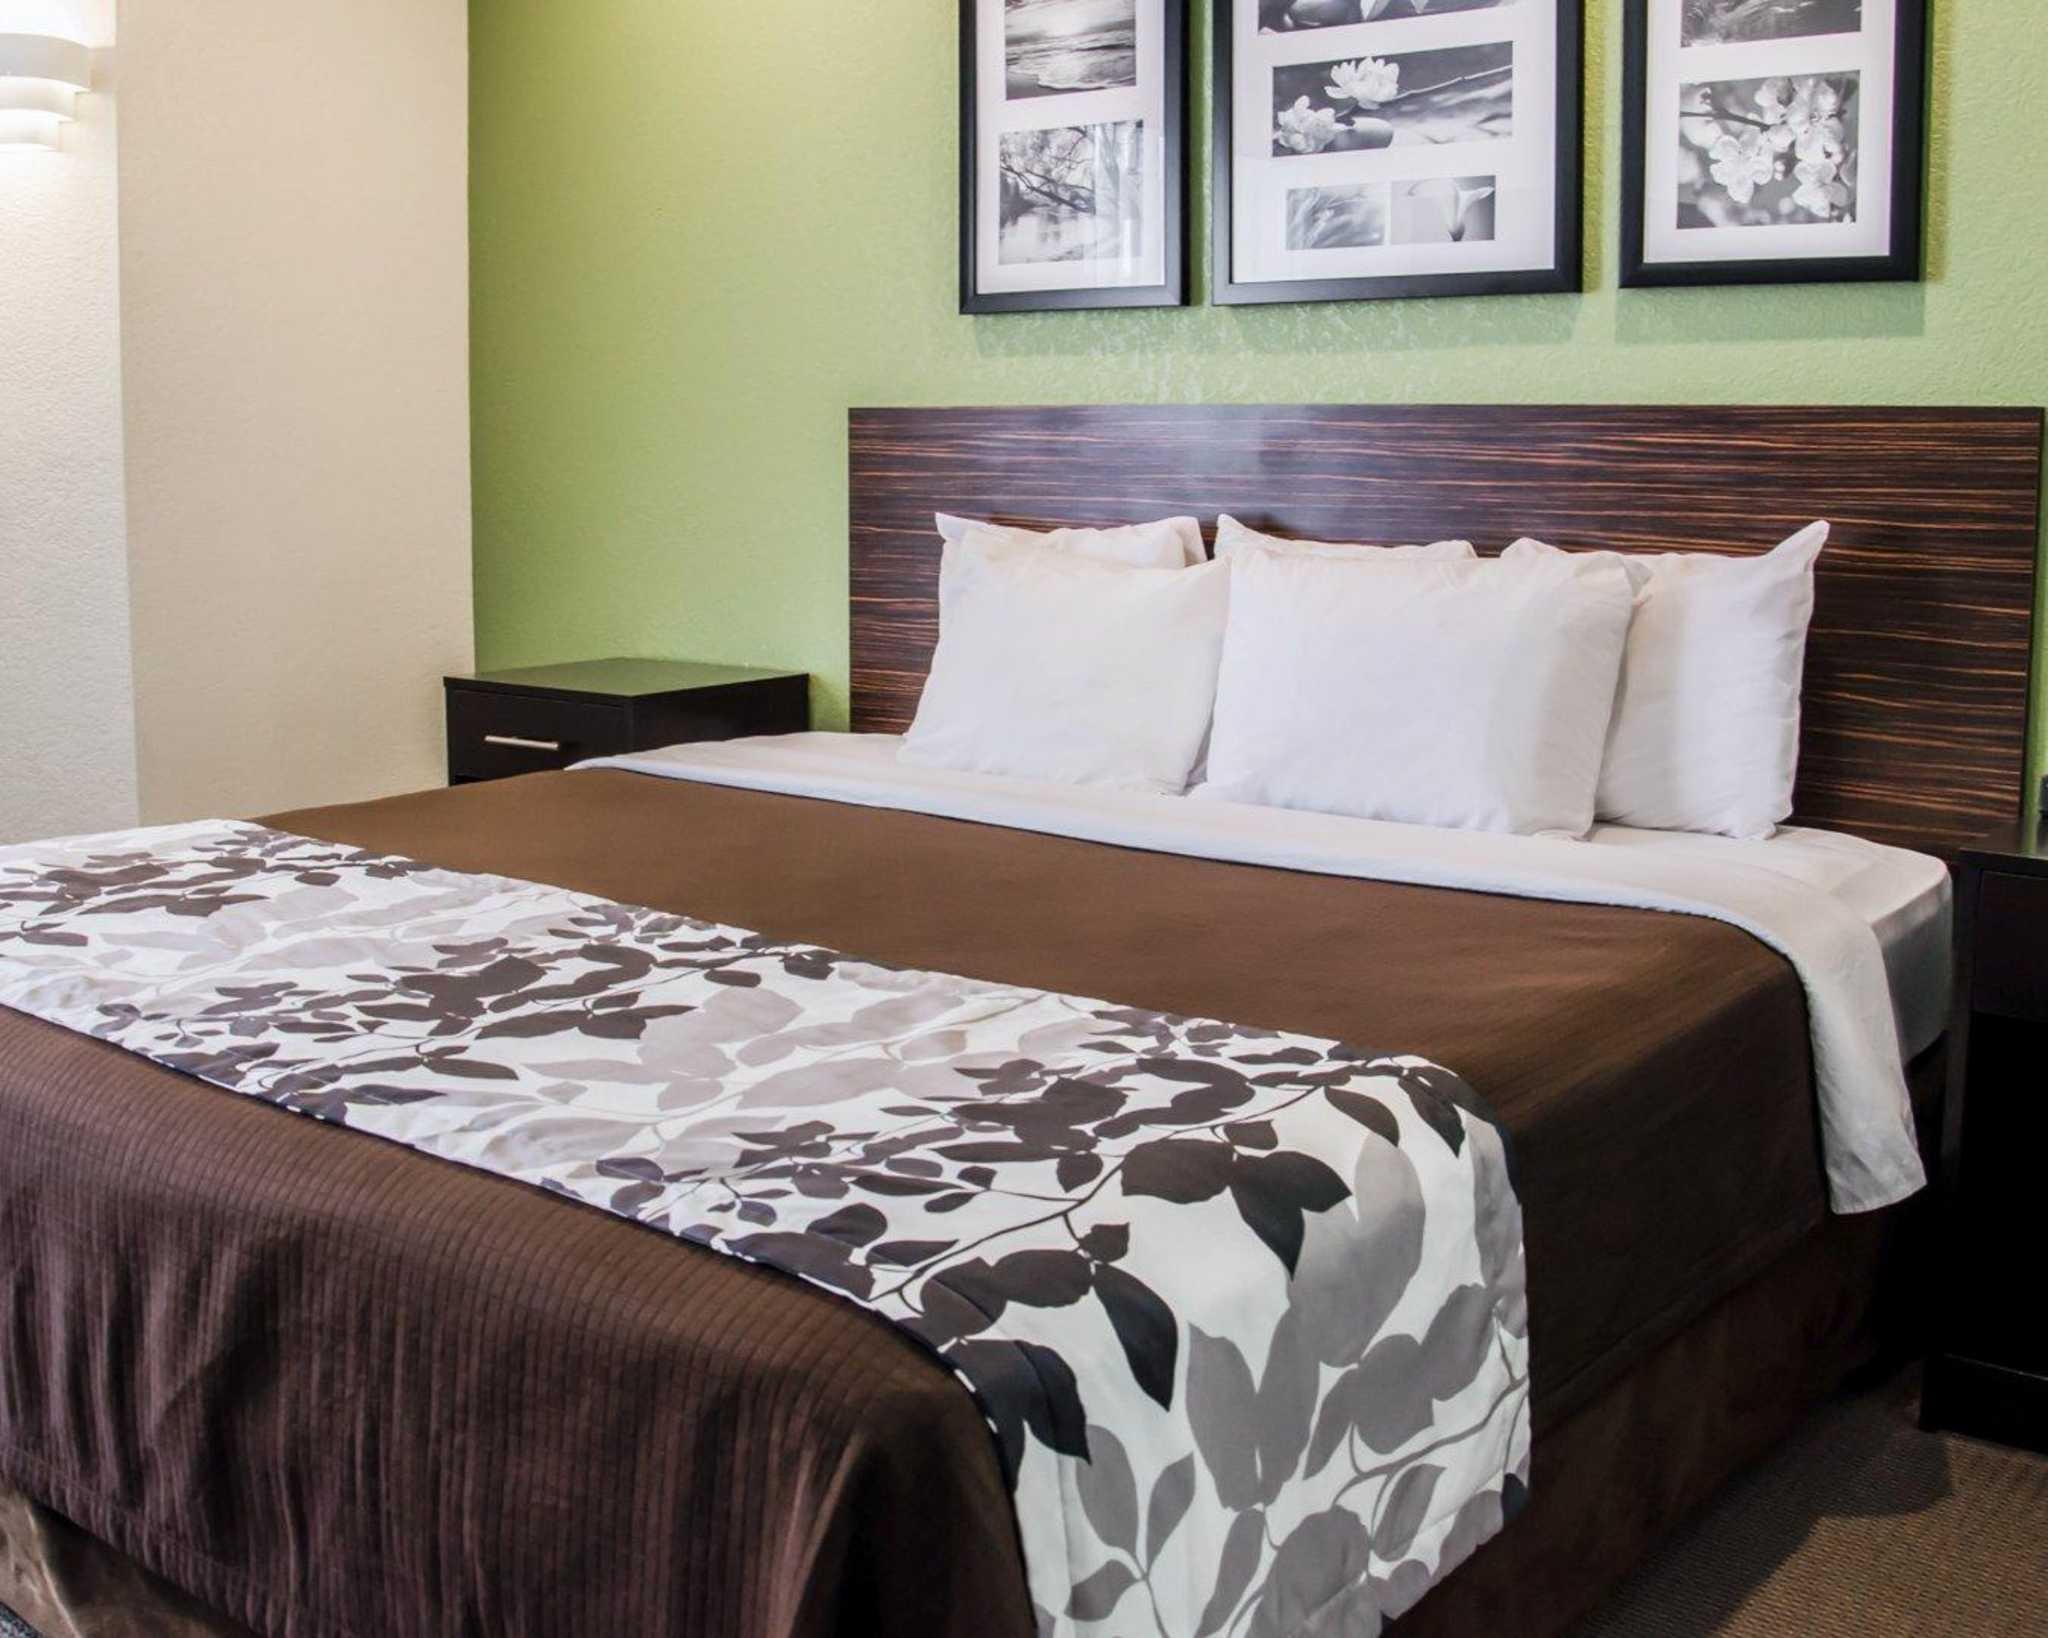 Sleep Inn Concord - Kannapolis image 7